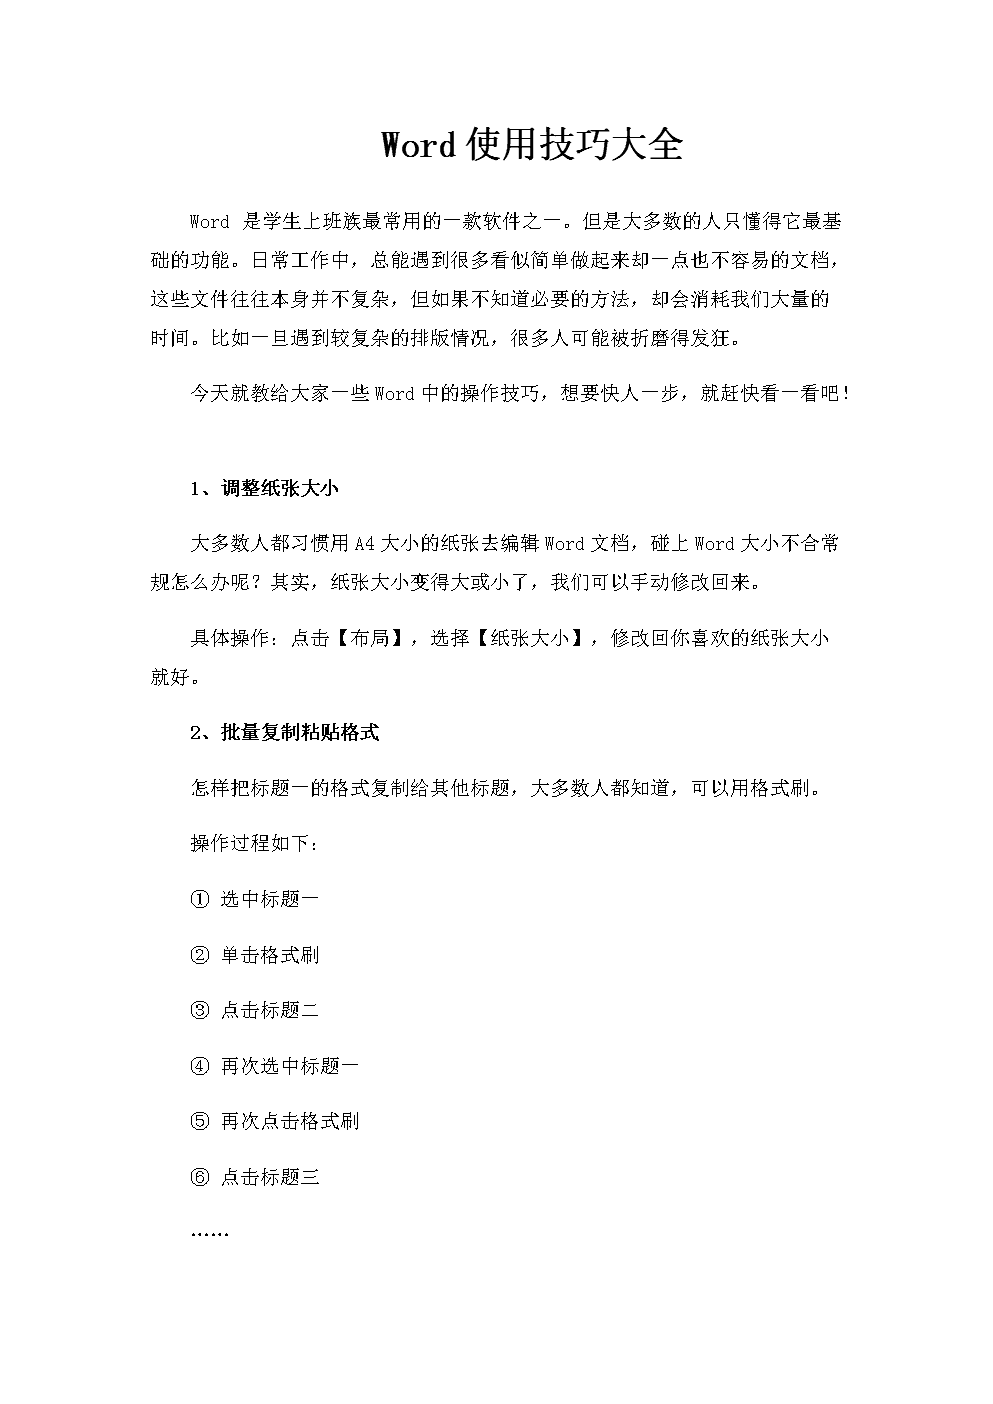 Word使用技巧大全.docx